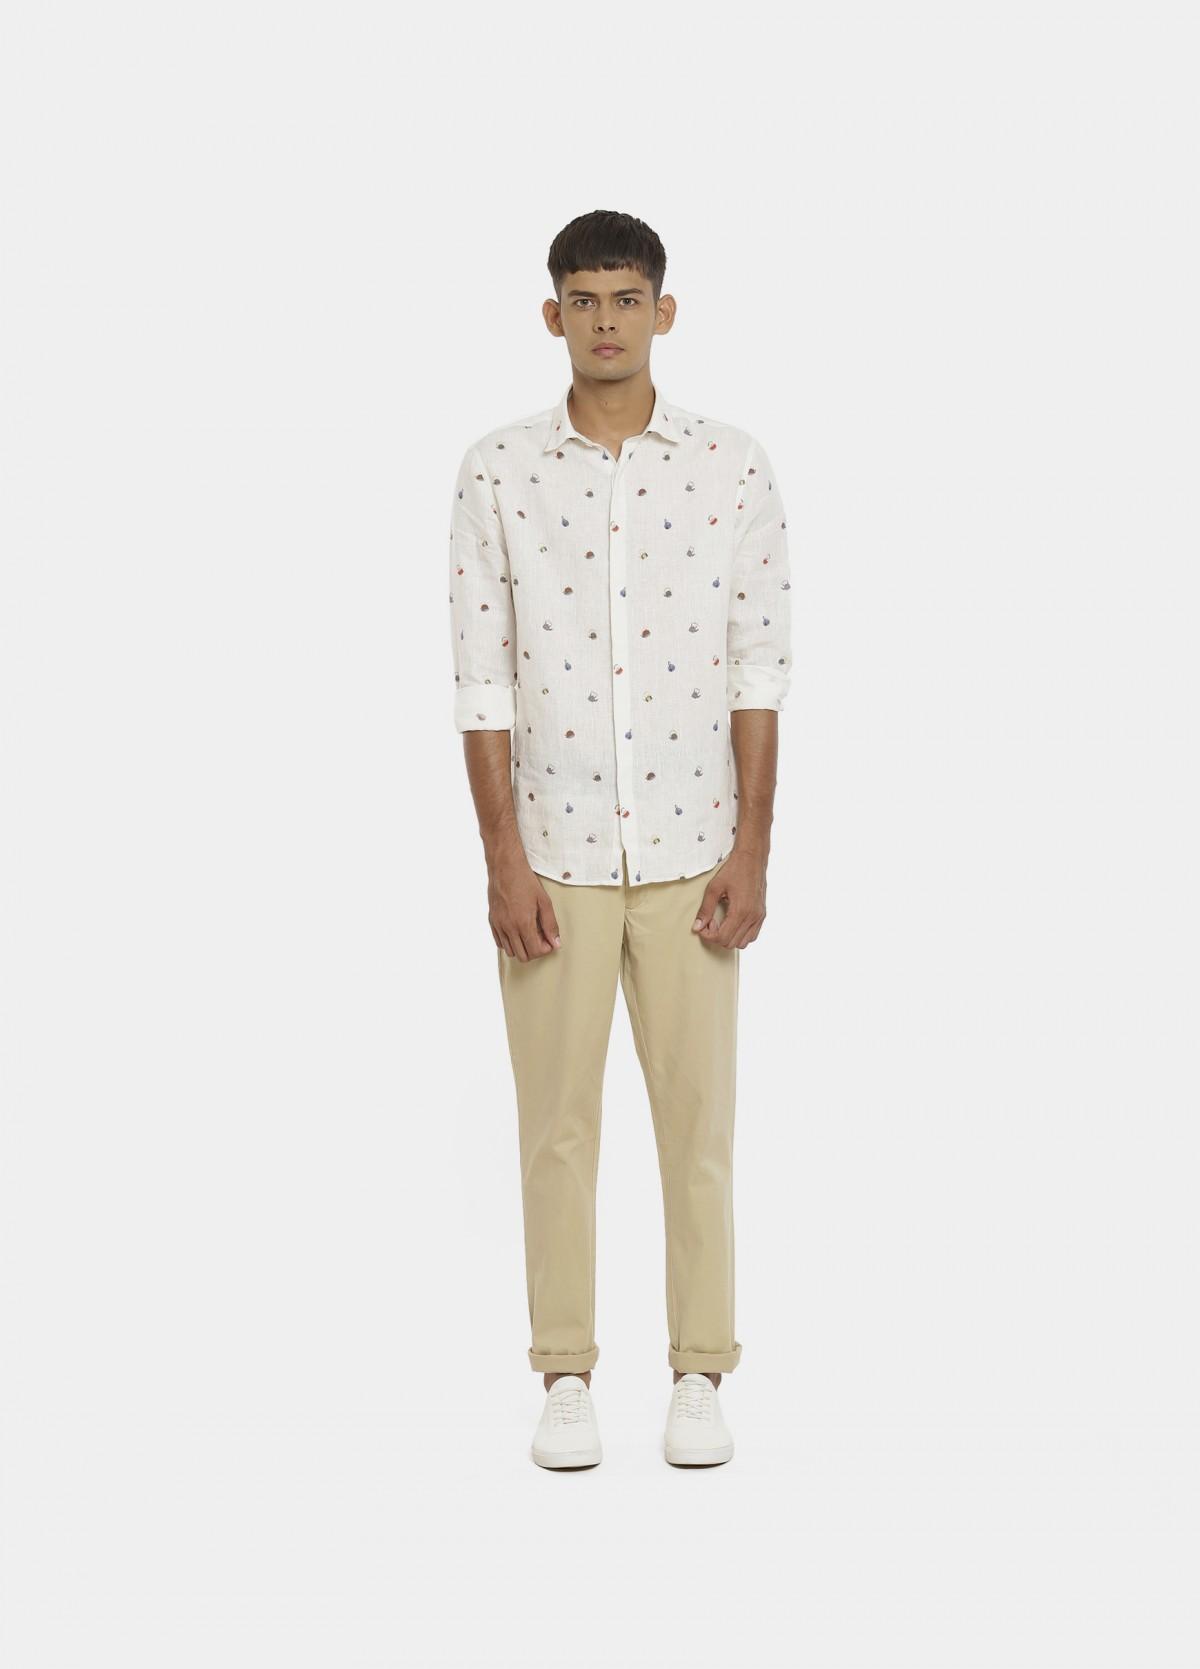 The Kettle Shirt